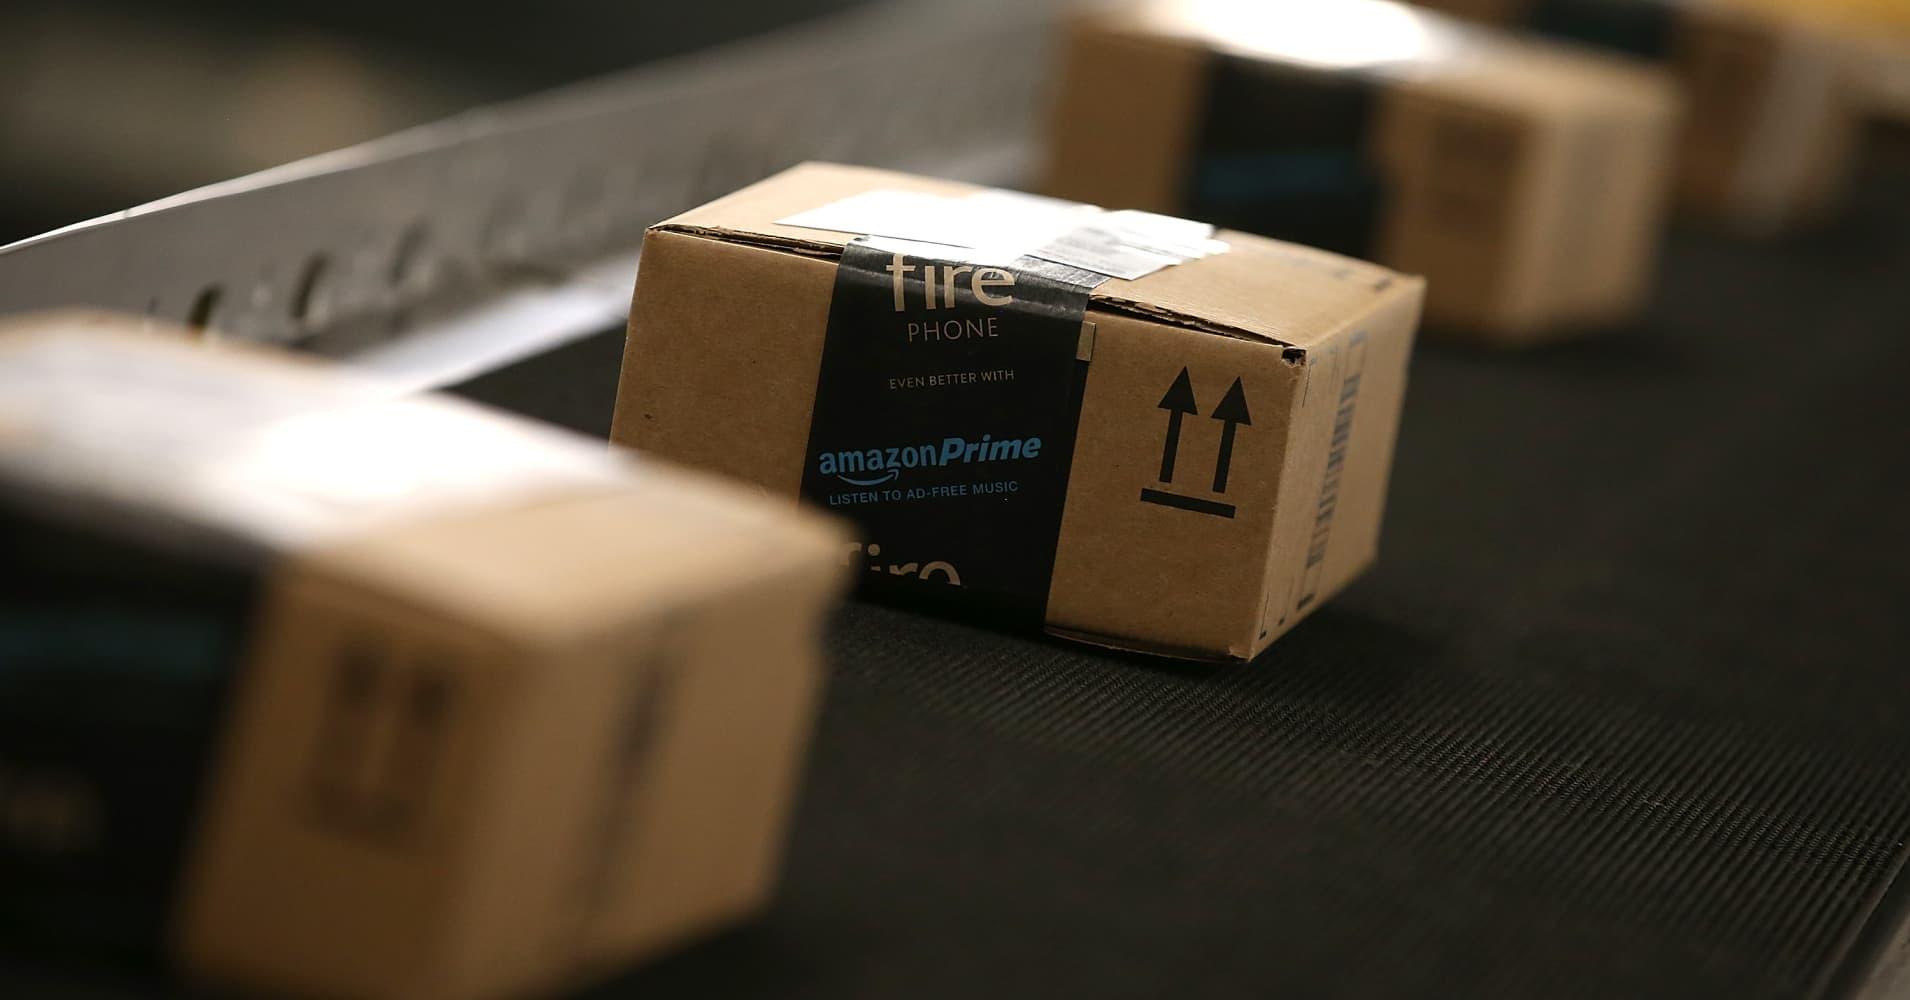 Boxes move along a conveyor belt at an Amazon fulfillment center in Tracy, California.